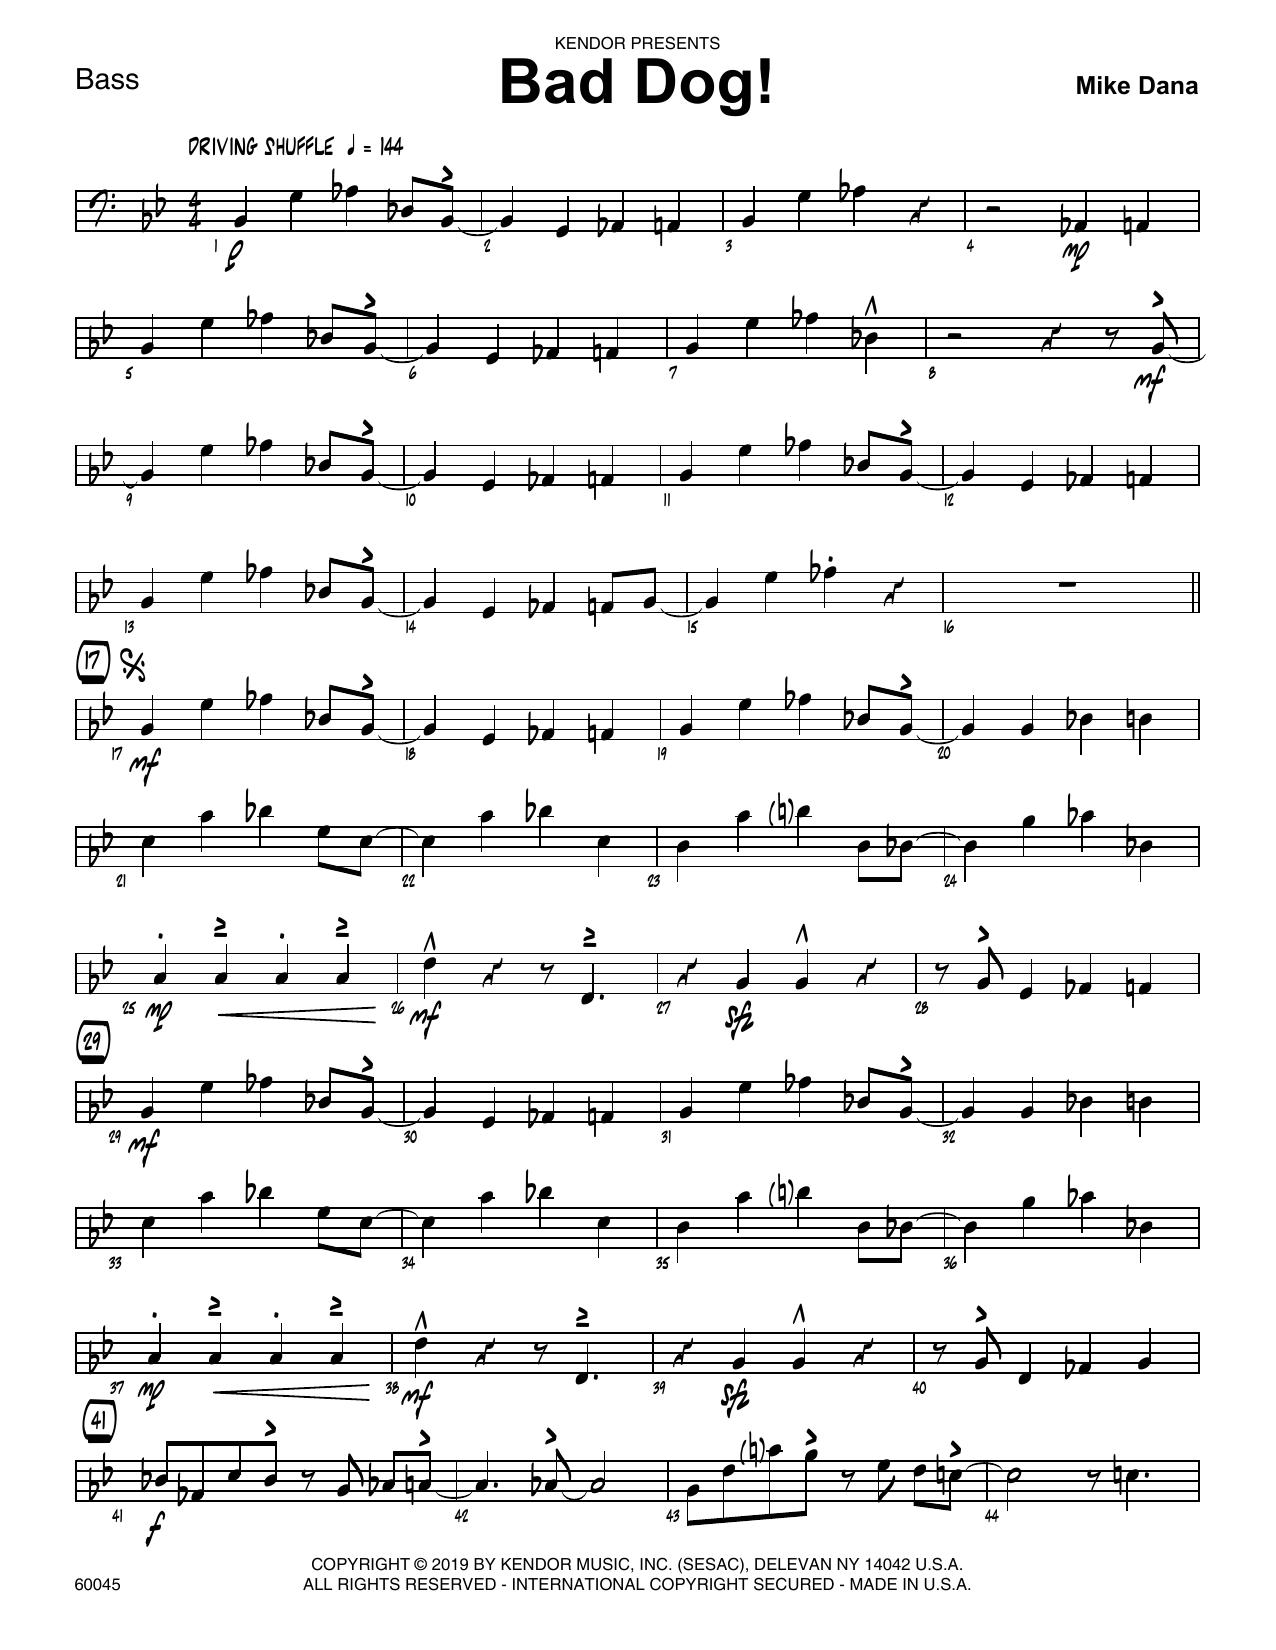 Mike Dana Bad Dog! - Bass sheet music notes and chords. Download Printable PDF.